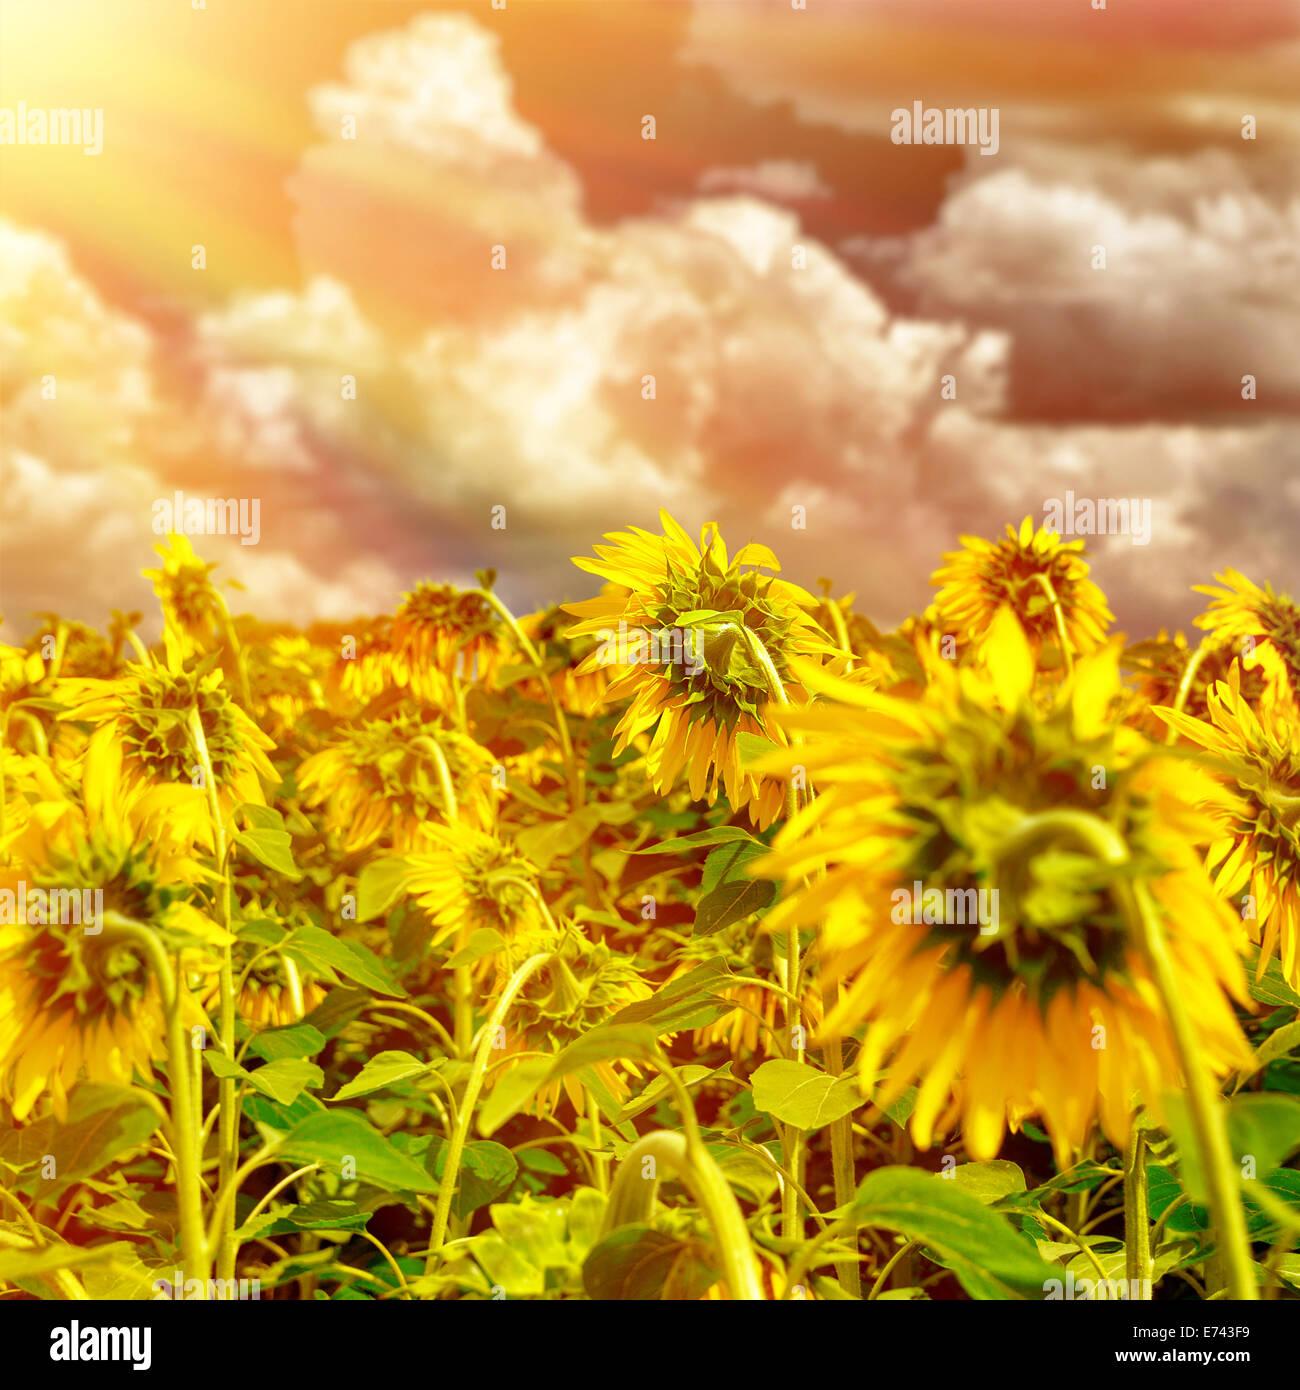 Blooming big beautiful sunflowers on stock photos blooming big sunflower field on sunset ripe sunflowers field beautiful big yellow flowers europe in izmirmasajfo